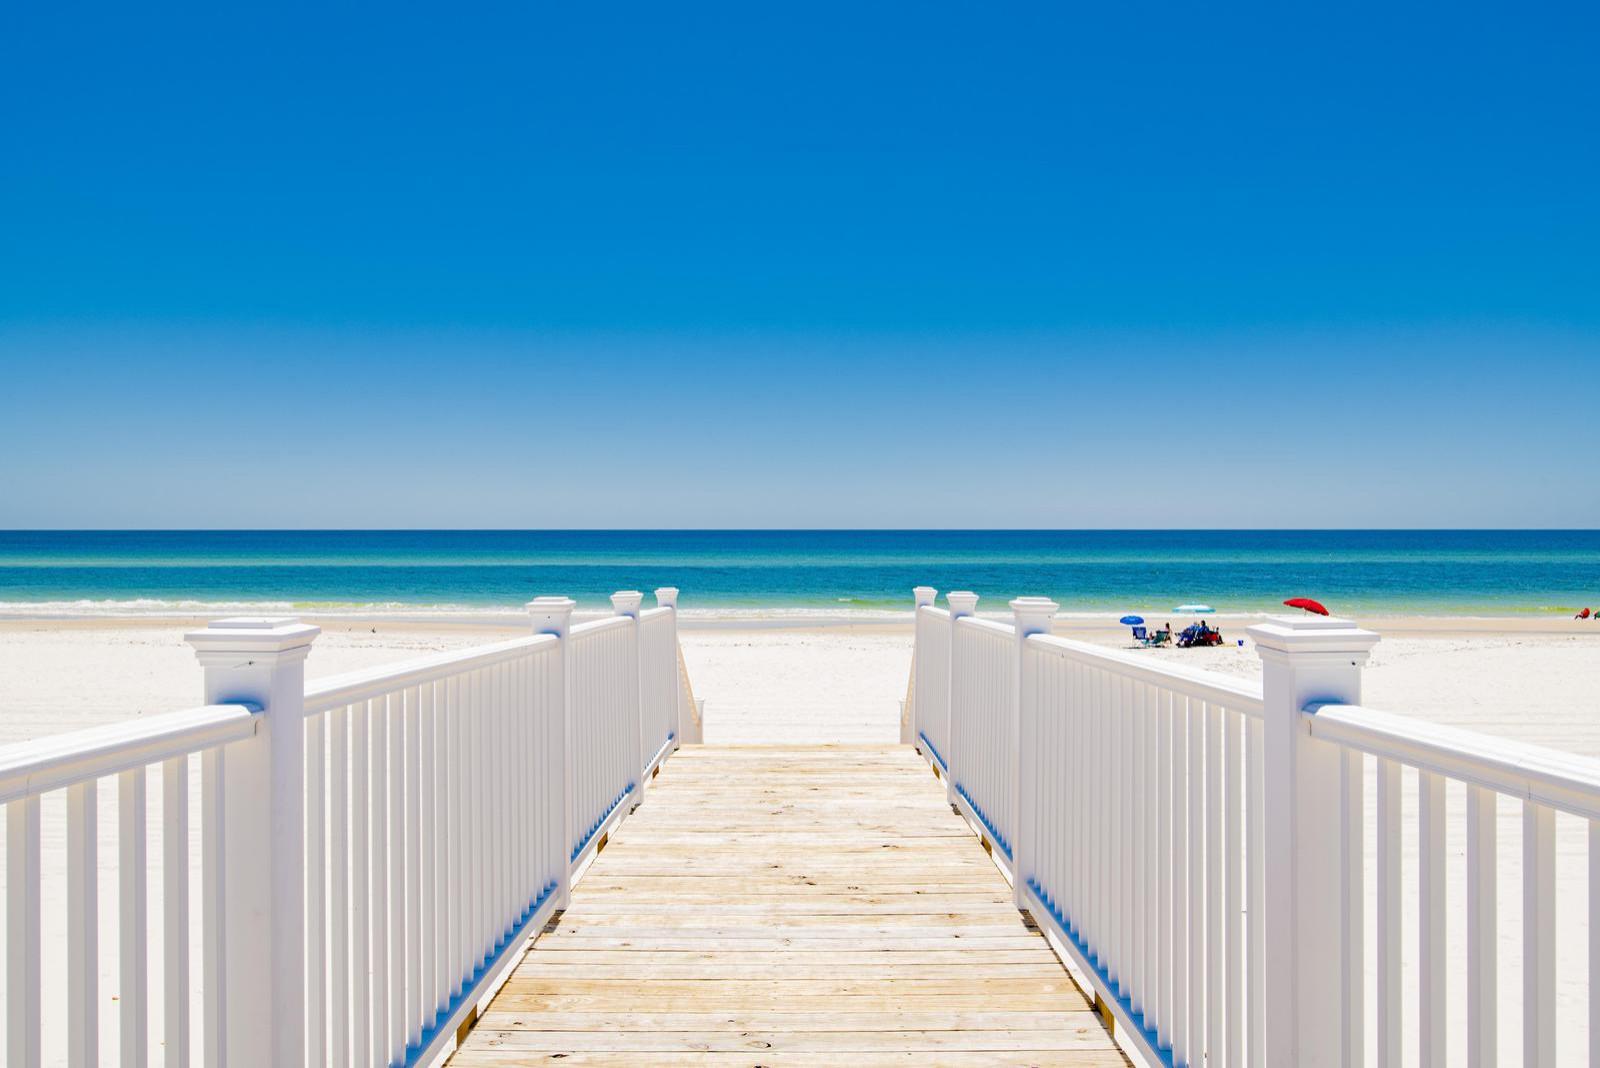 Seaside East / West